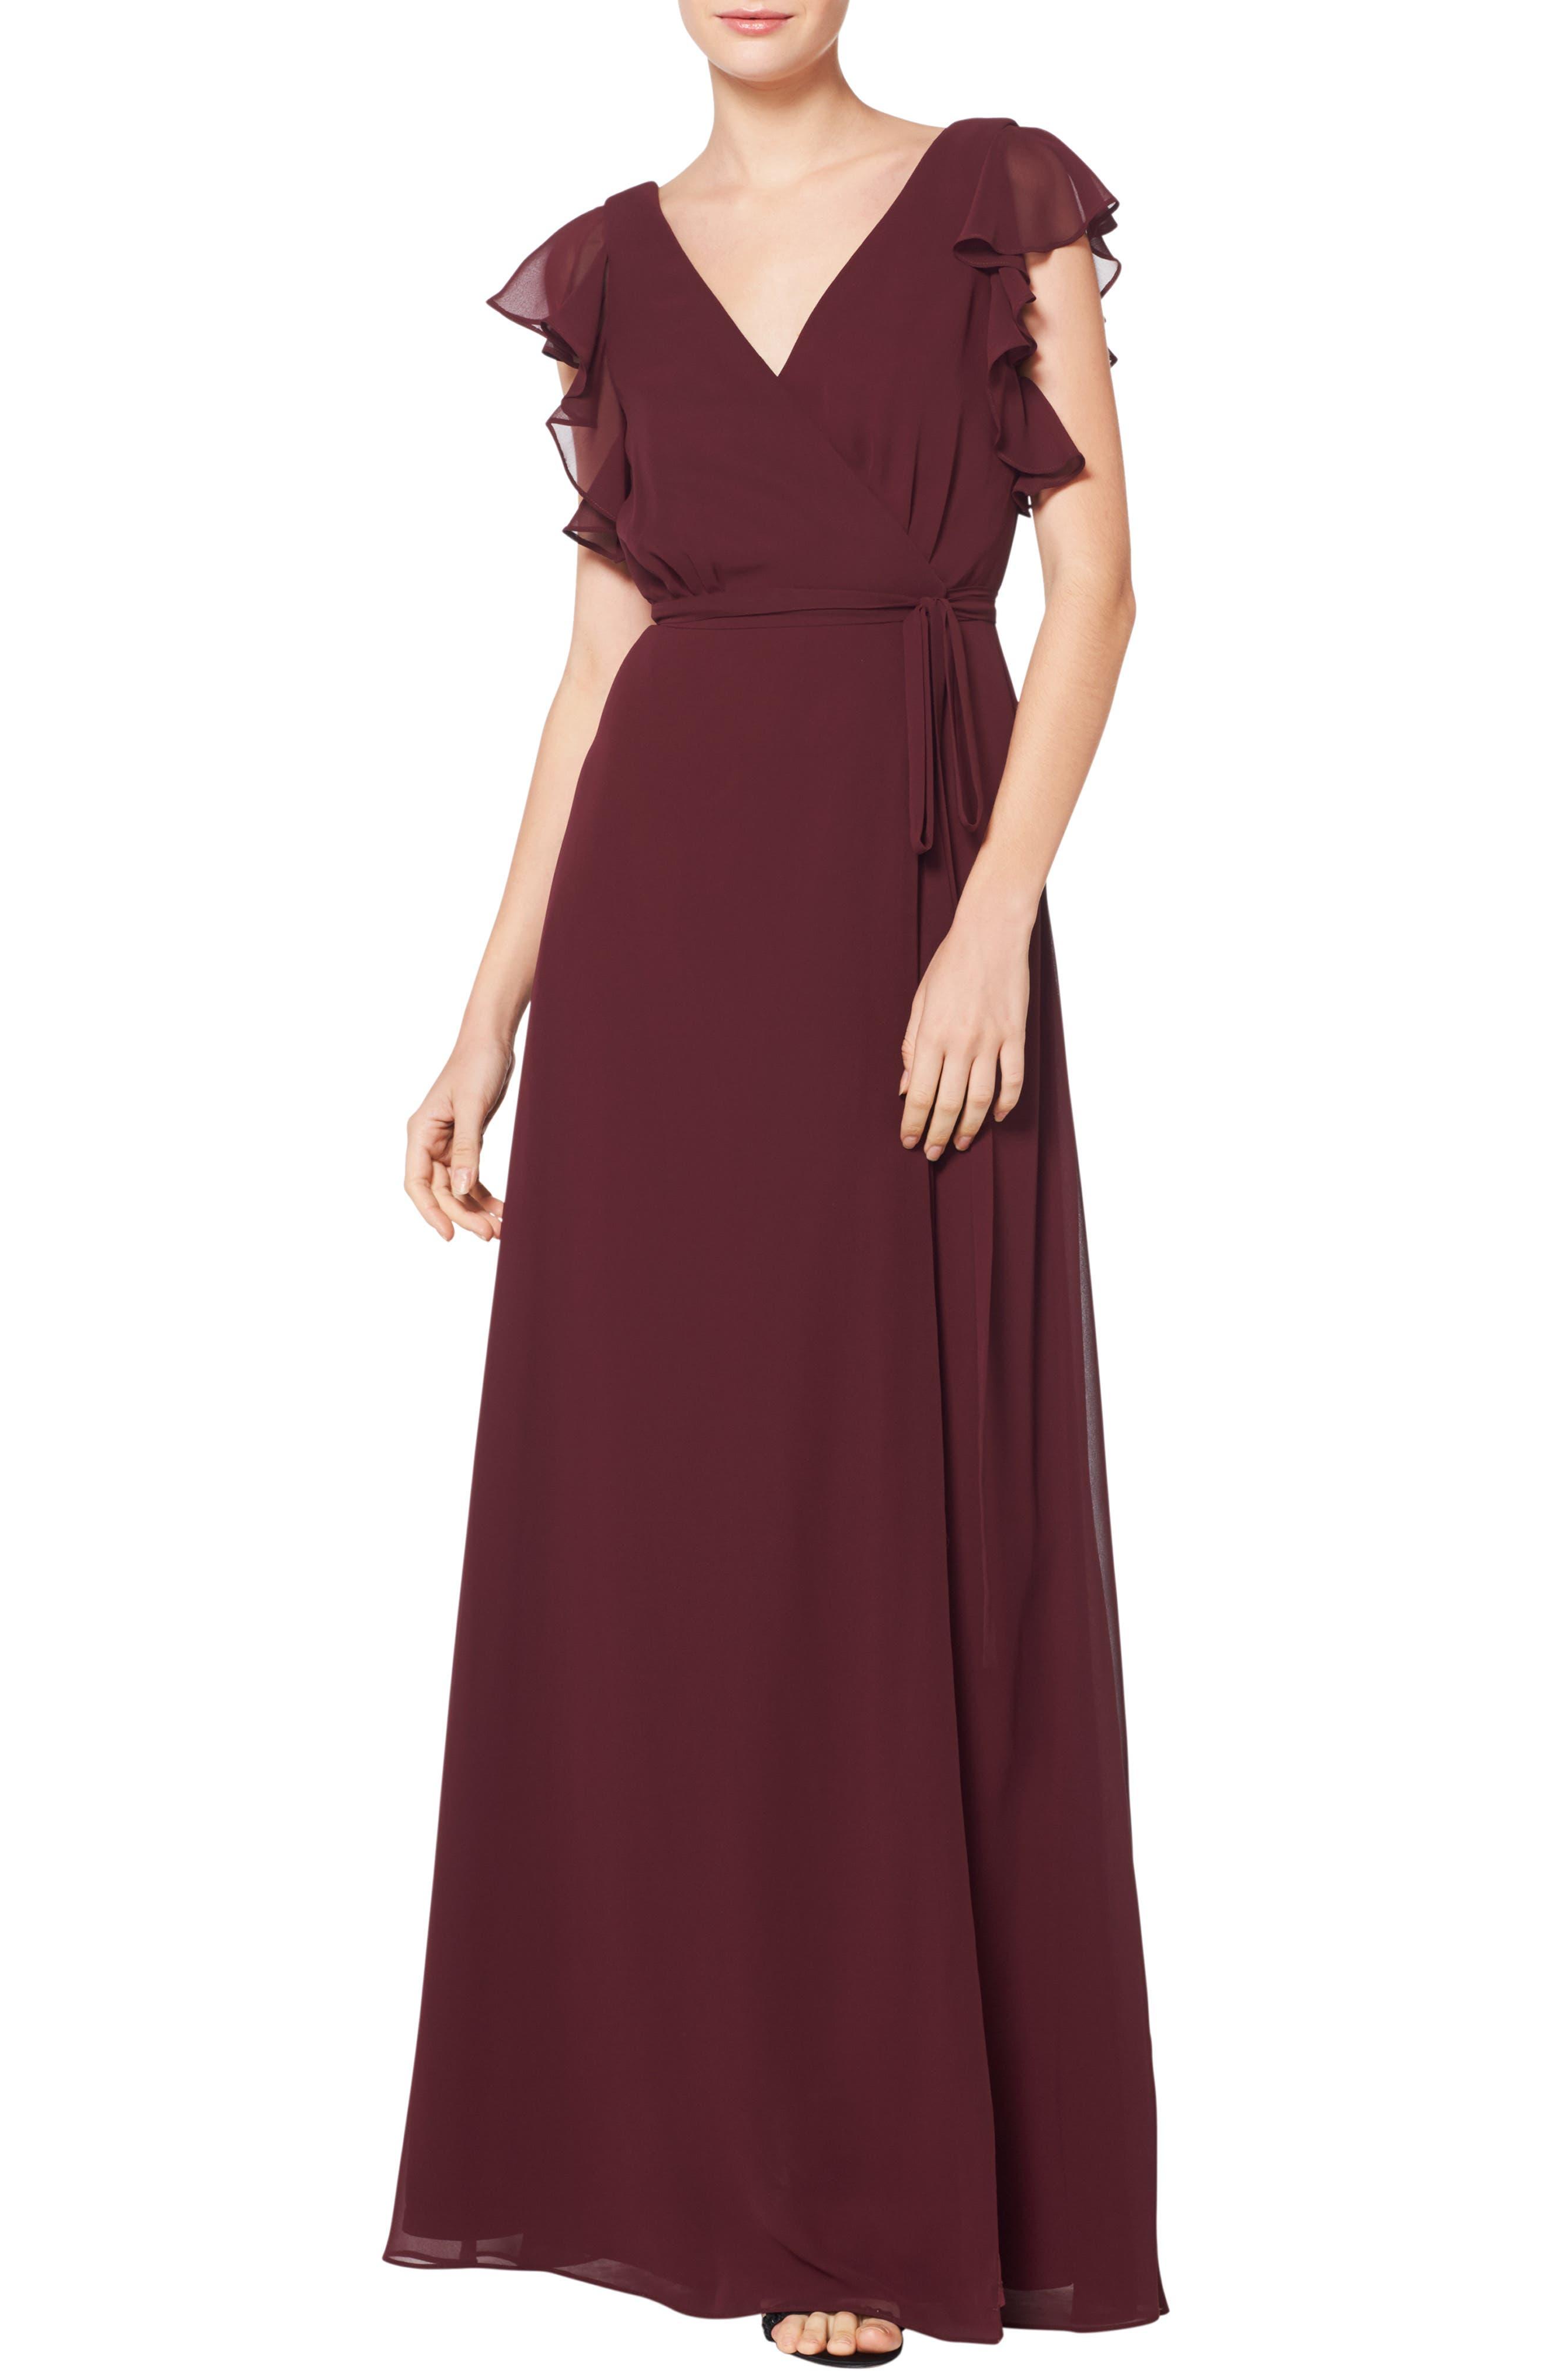 #levkoff Ruffle Sleeve Chiffon Wrap Evening Dress, Burgundy